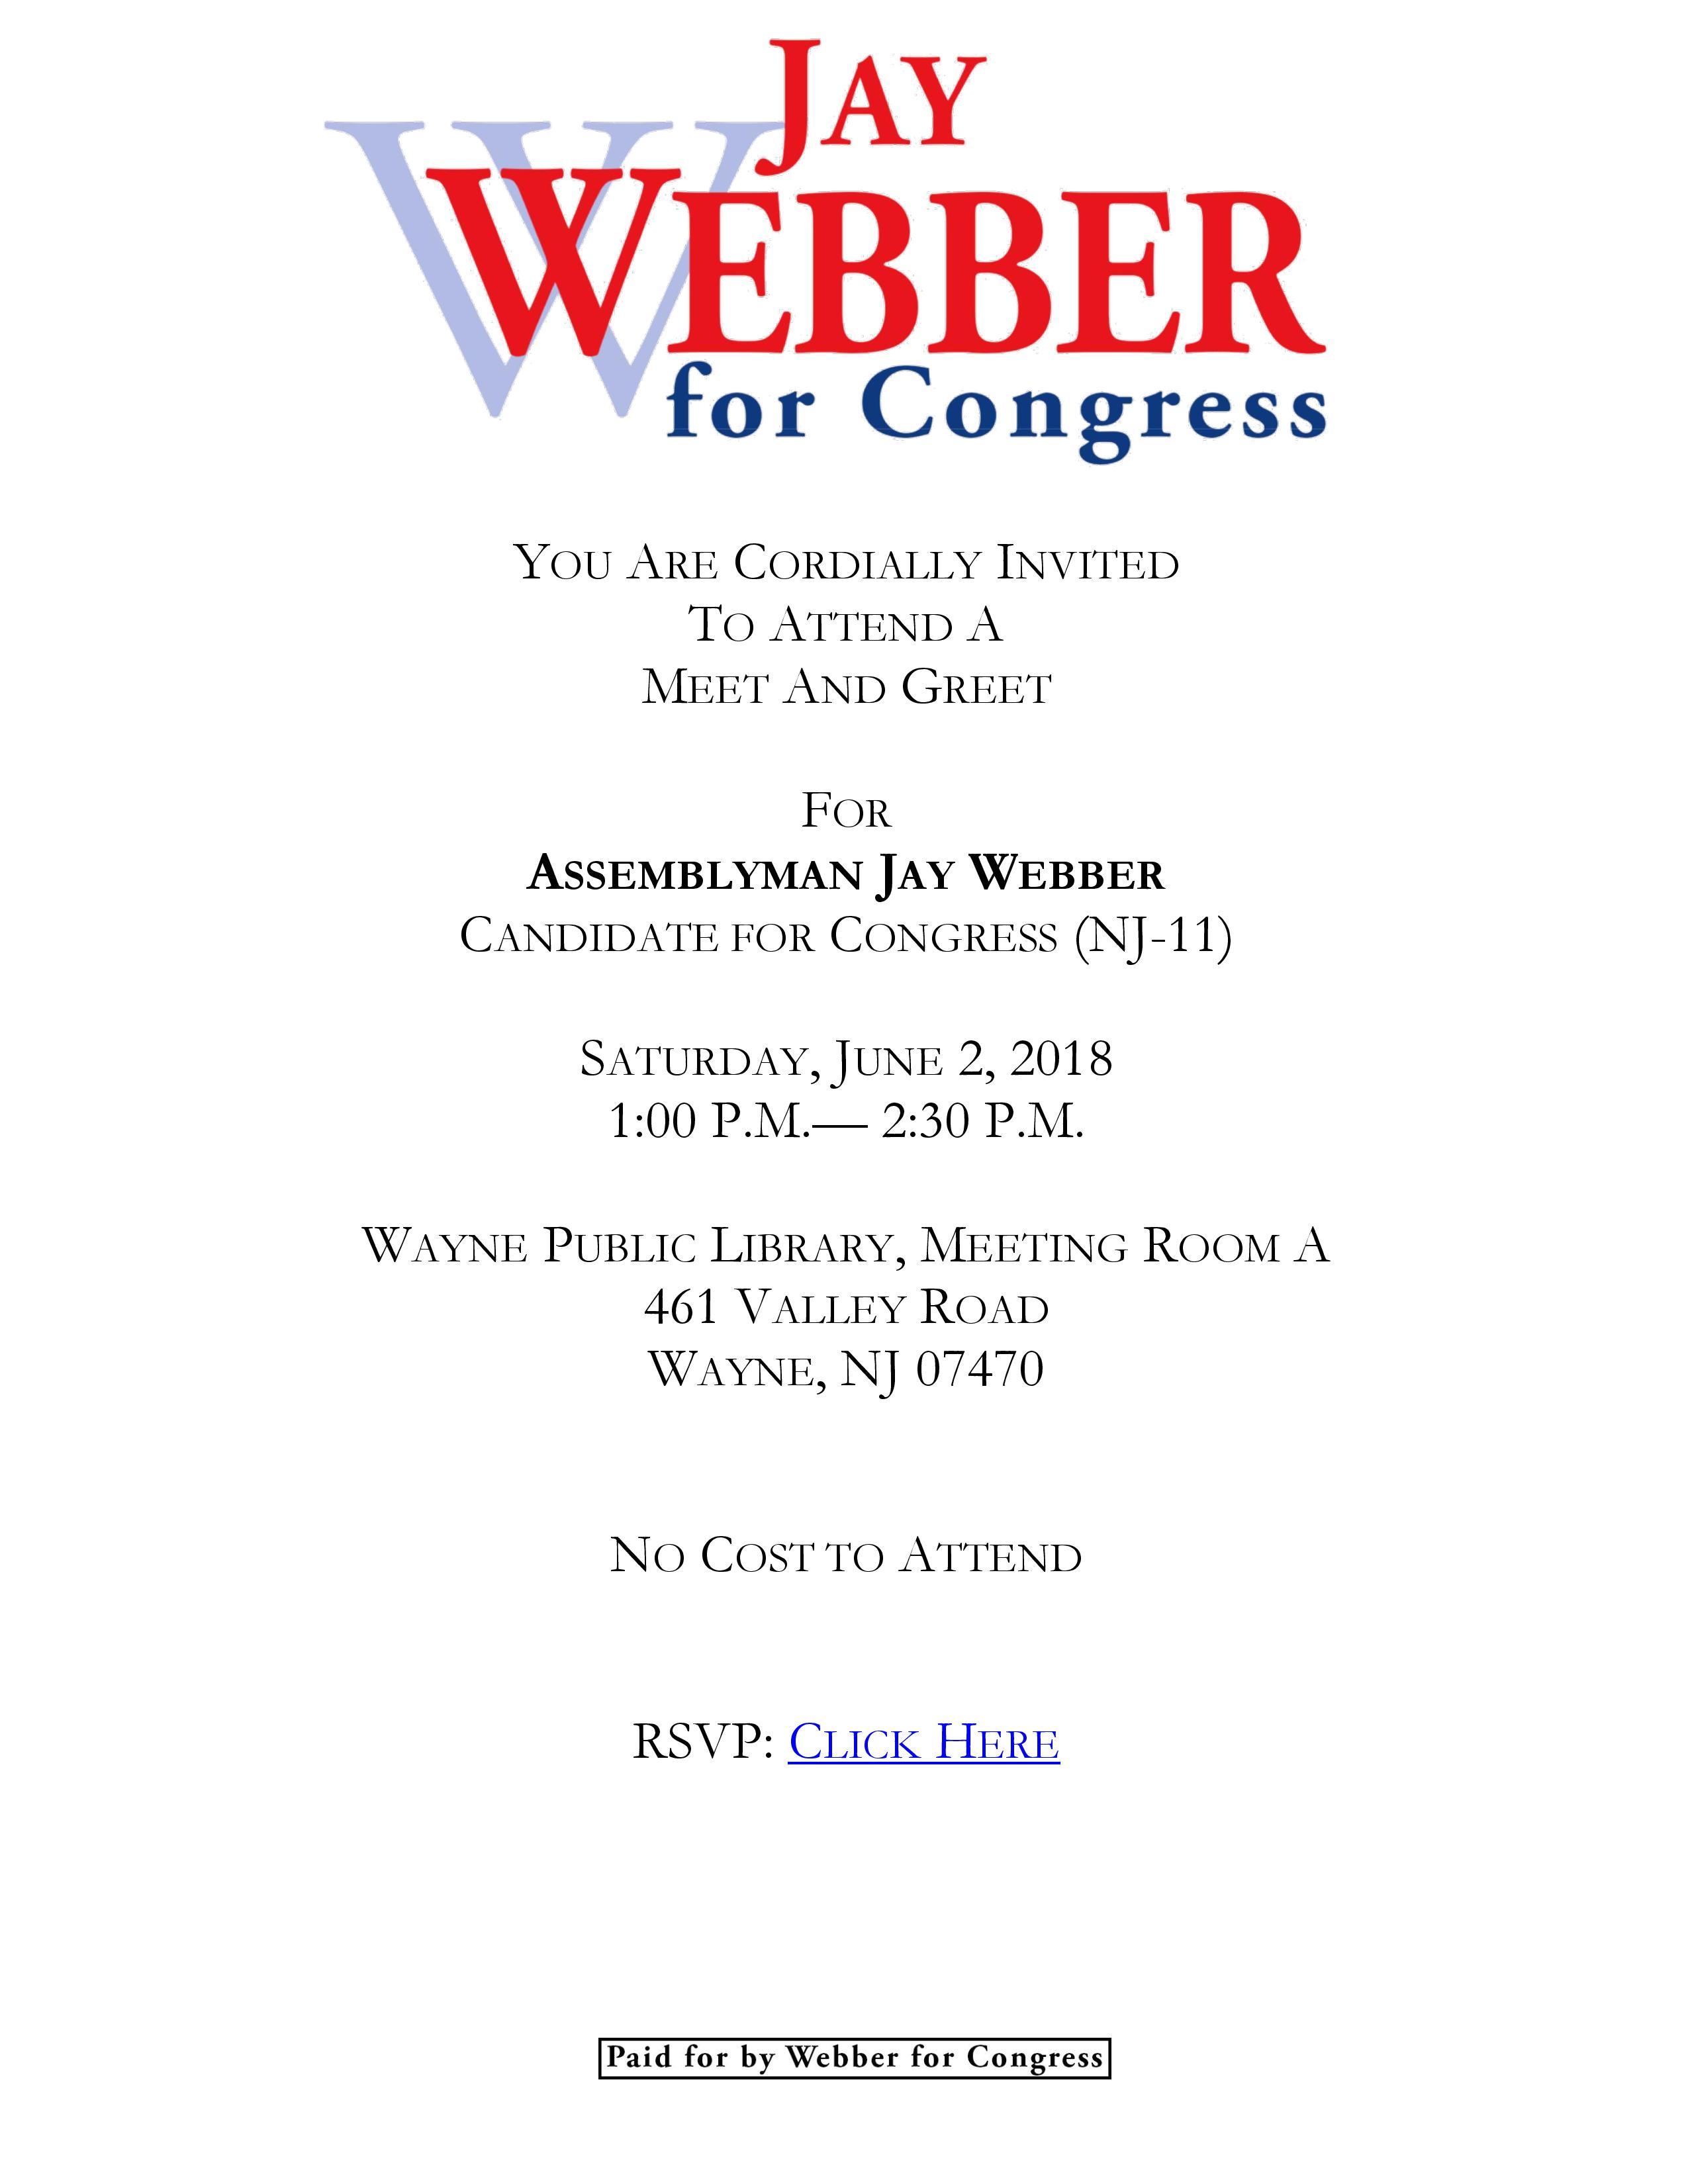 Webber_Wayne_Meet_and_Greet_Flyer-page-001.jpg